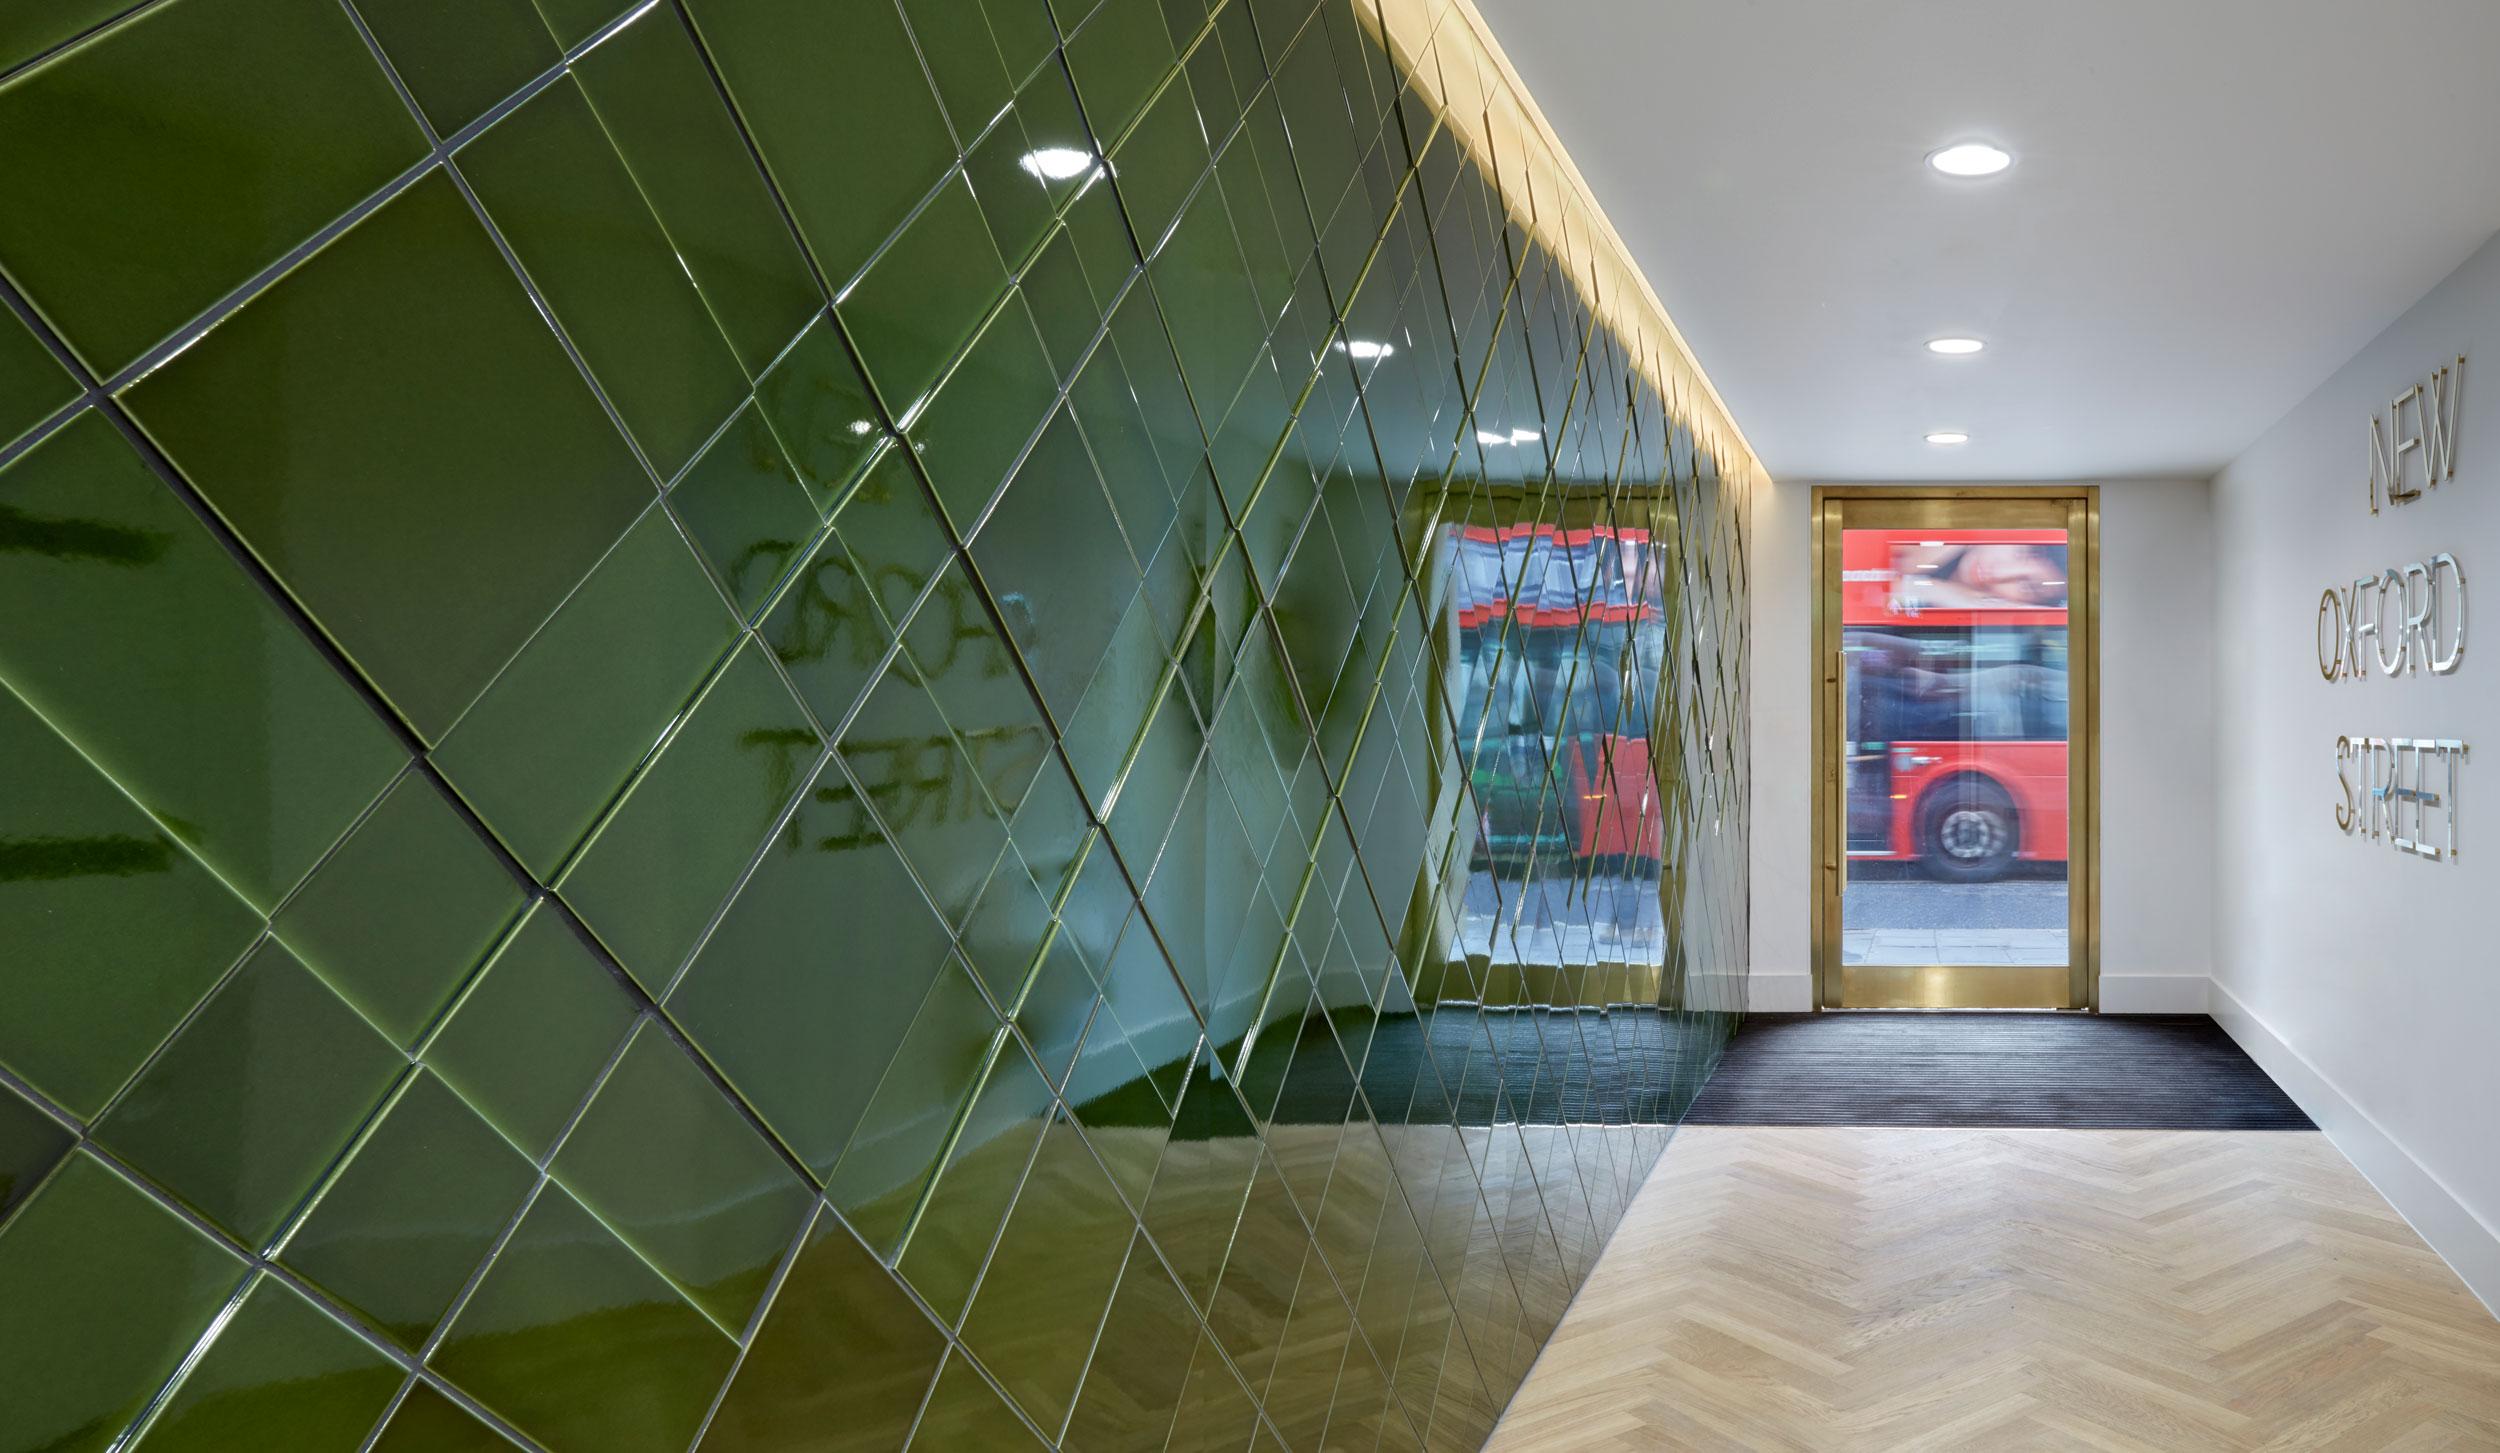 New Oxford Street Lts Architects